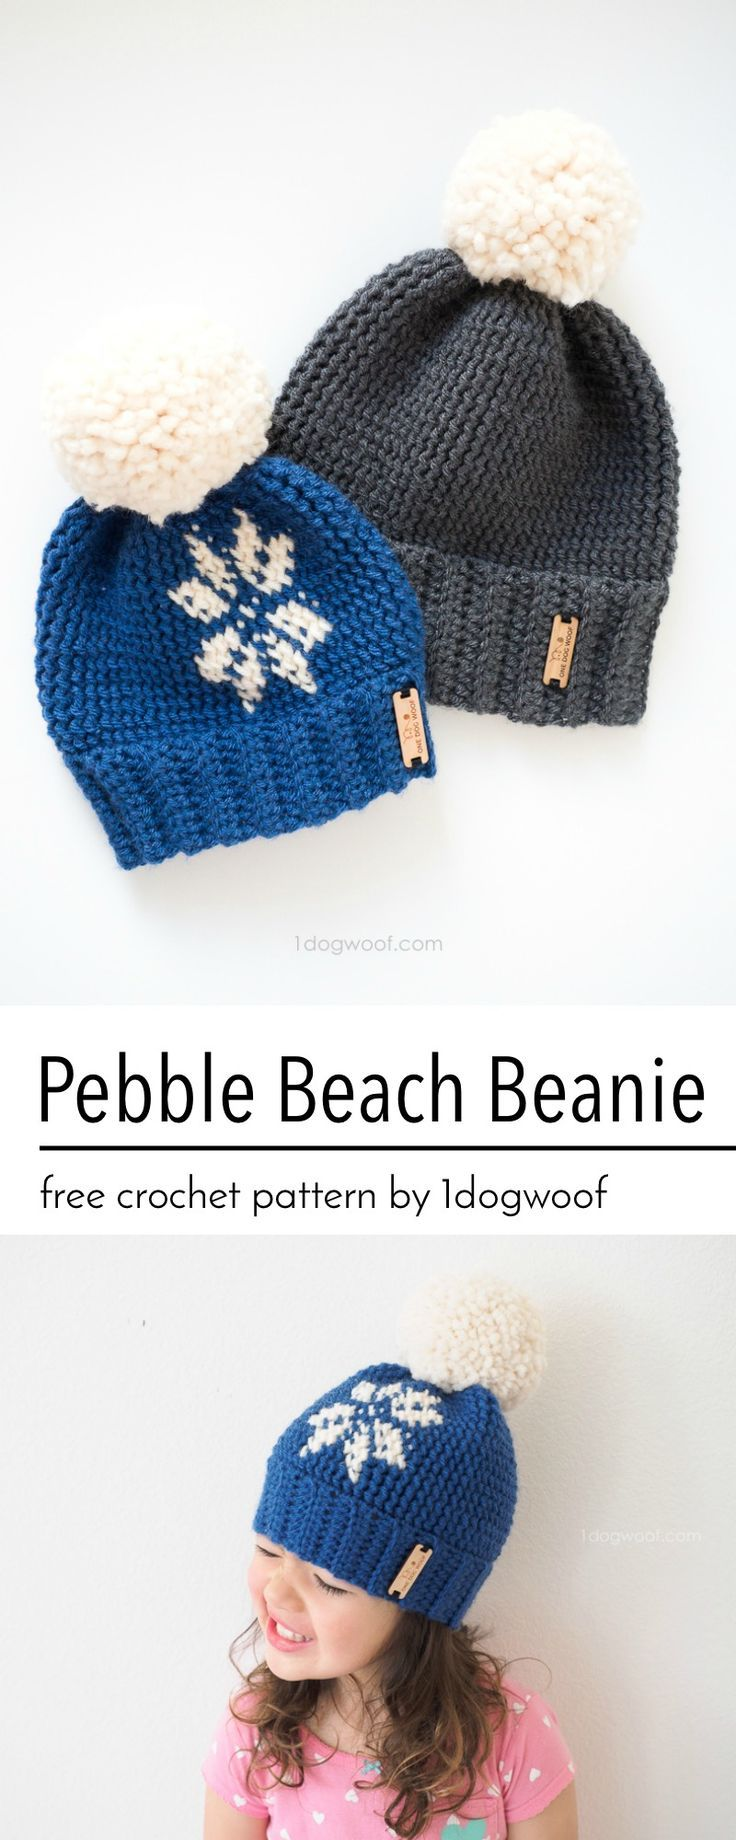 Pebble Beach Beanie Crochet Pattern | Gorros, Gorro bebe y Bebe